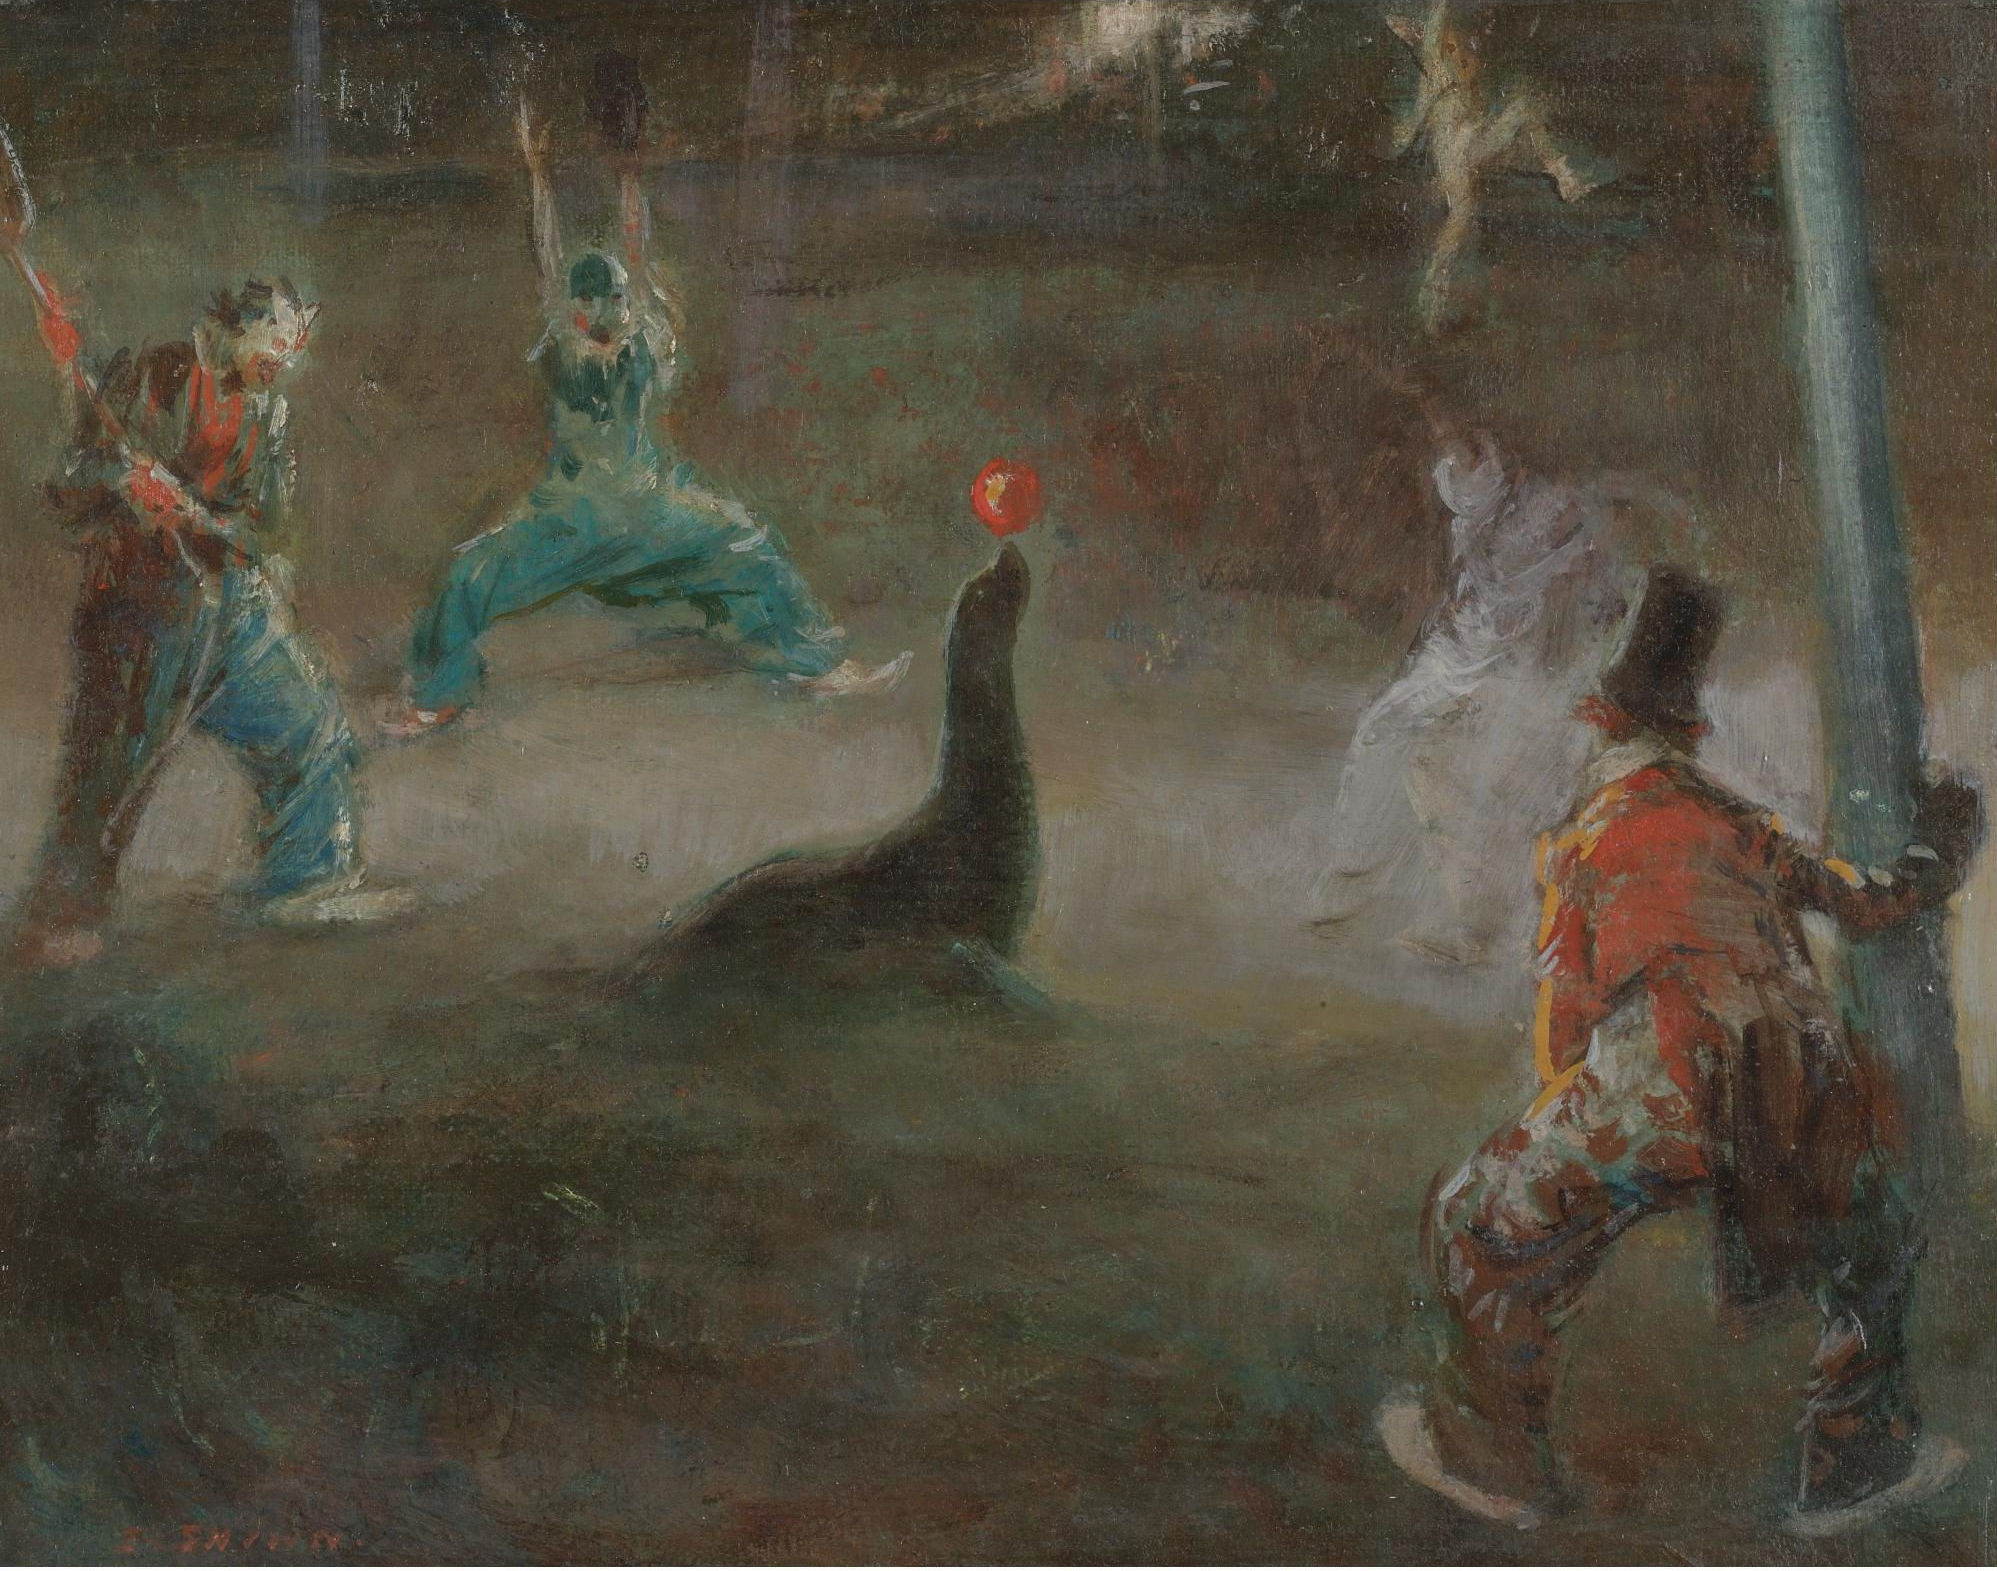 Живопись_Эверетт-Шинн_Clowns-Playing-Ball-with-Seal.jpg